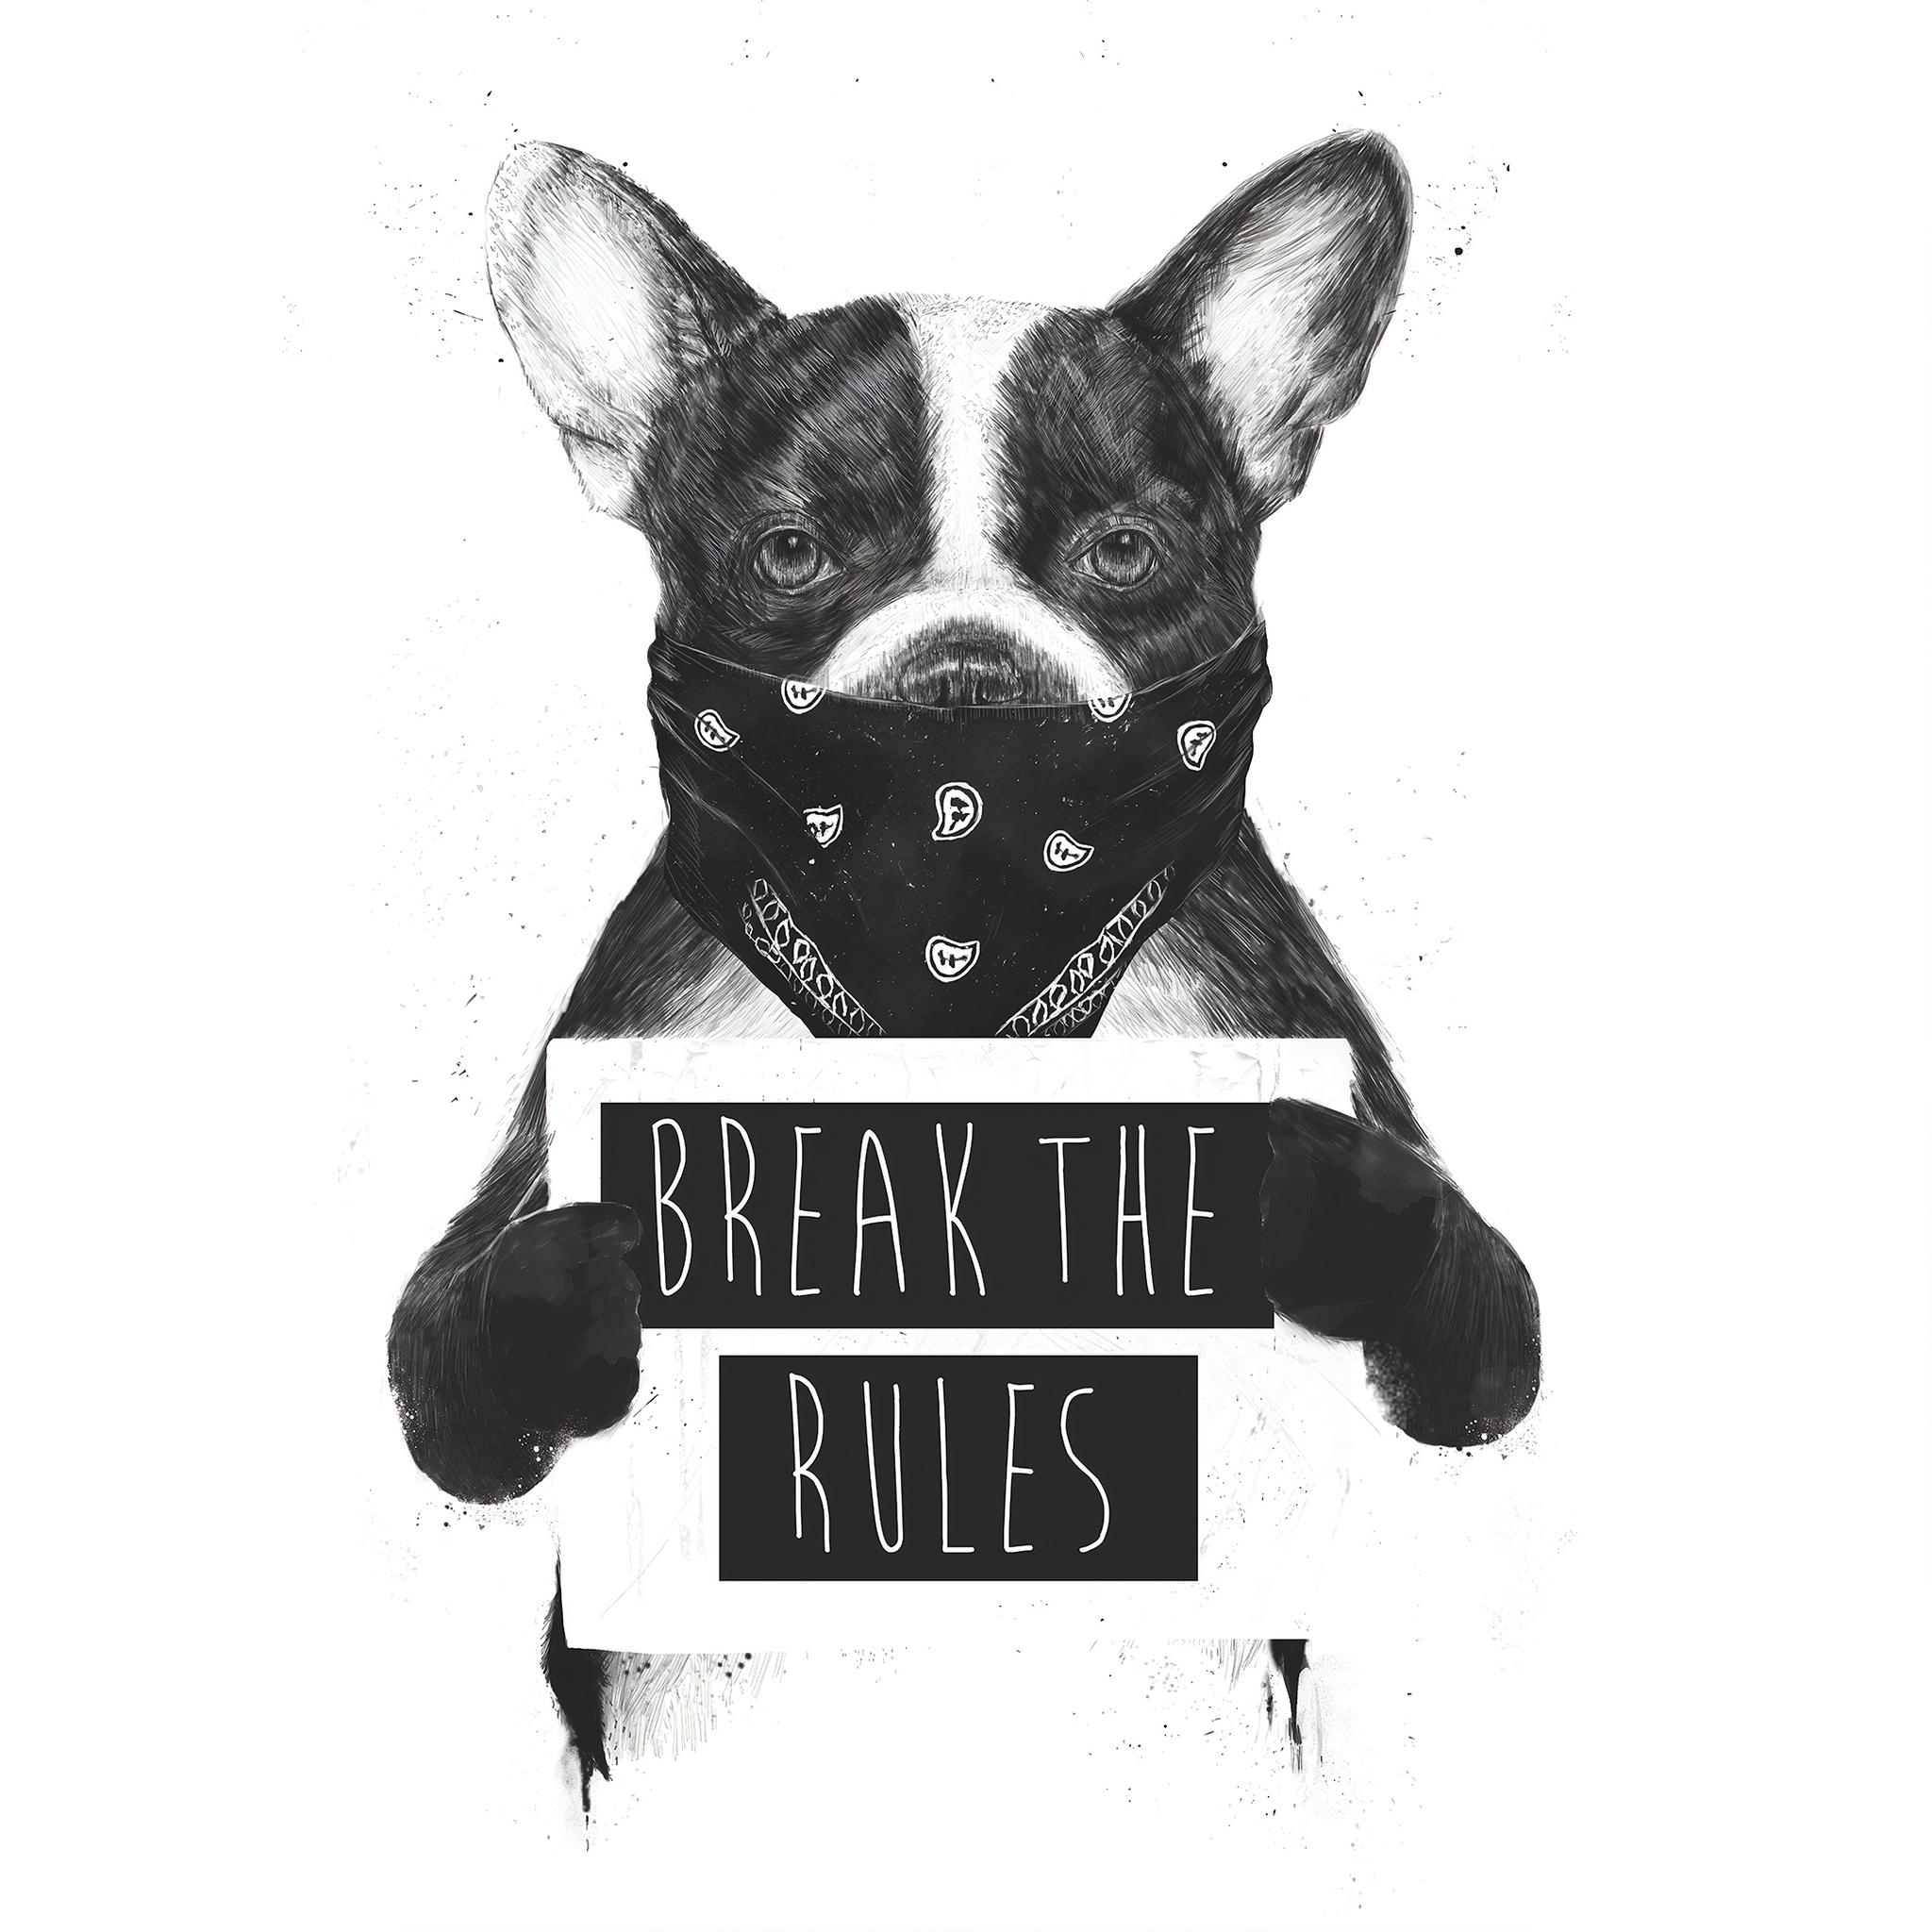 rebel-dog-4k-o3.jpg